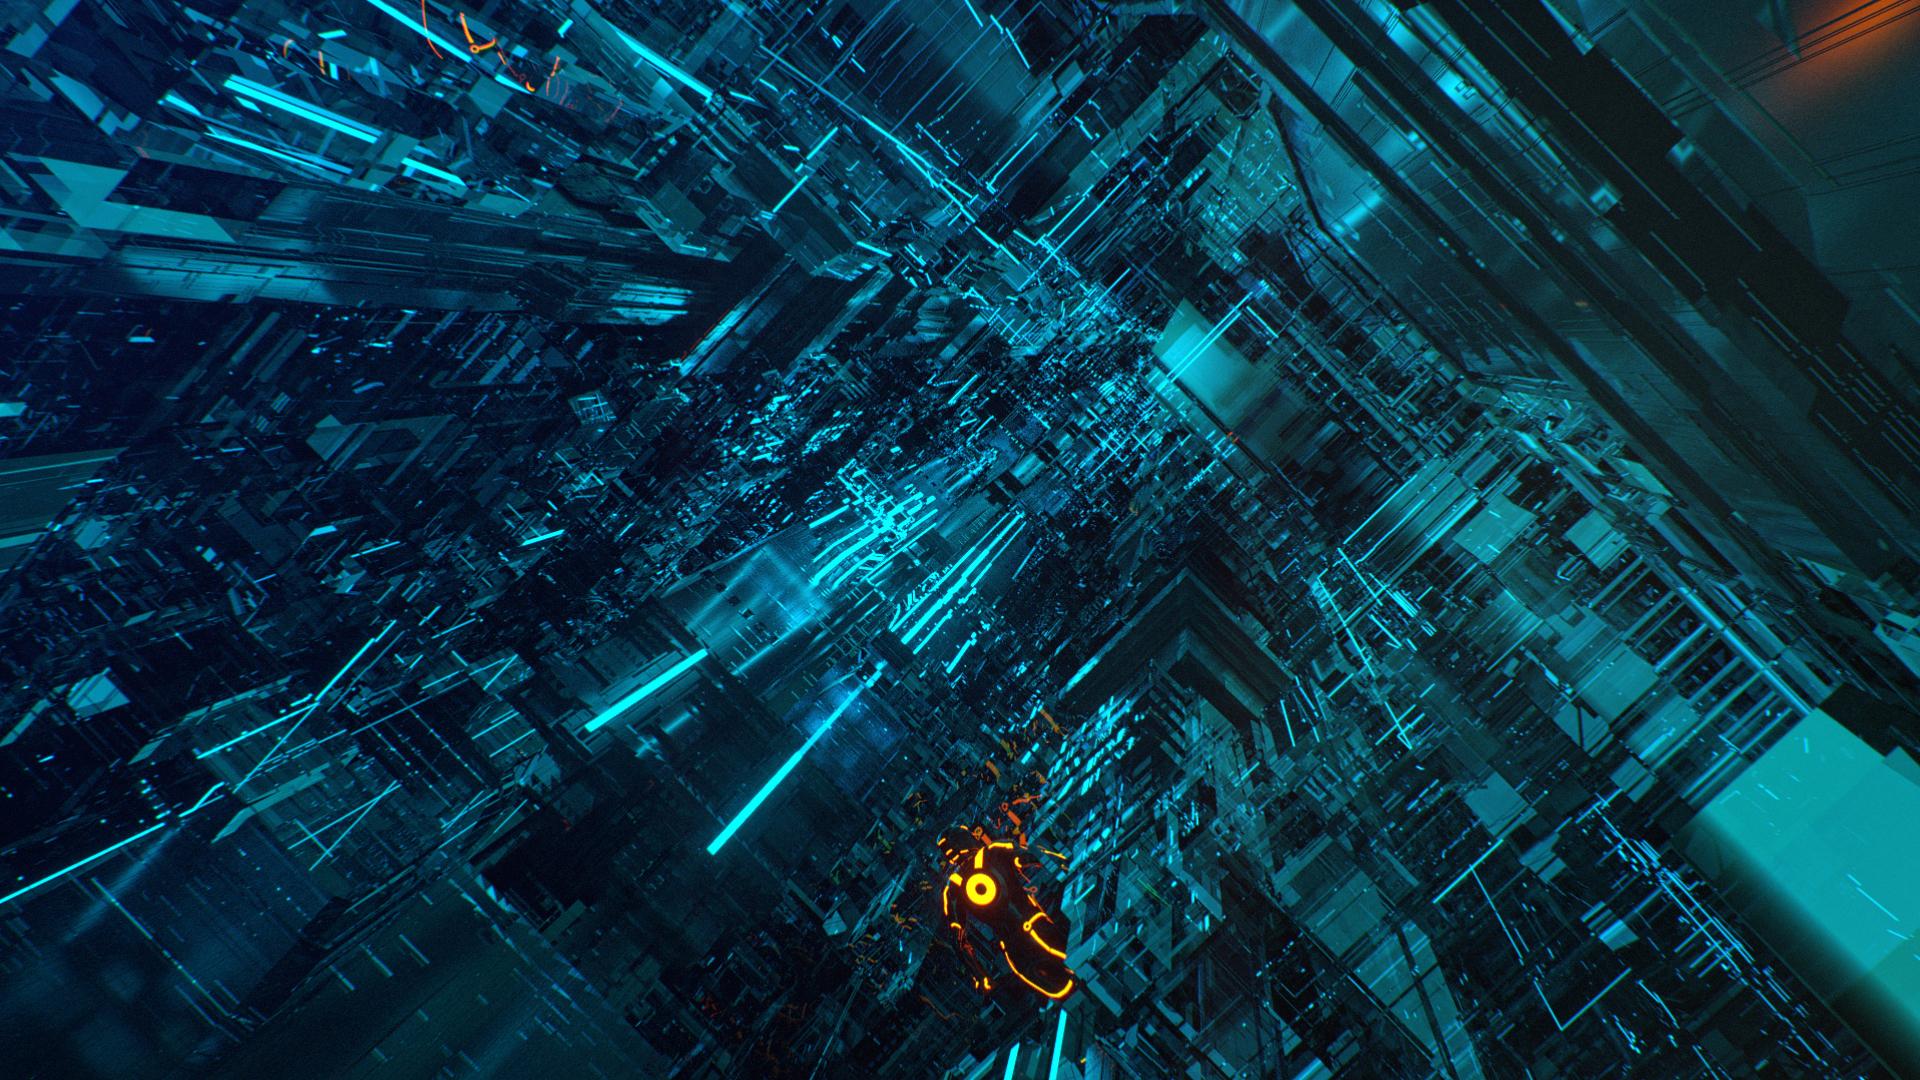 Michael Rigley: Tron Concepts